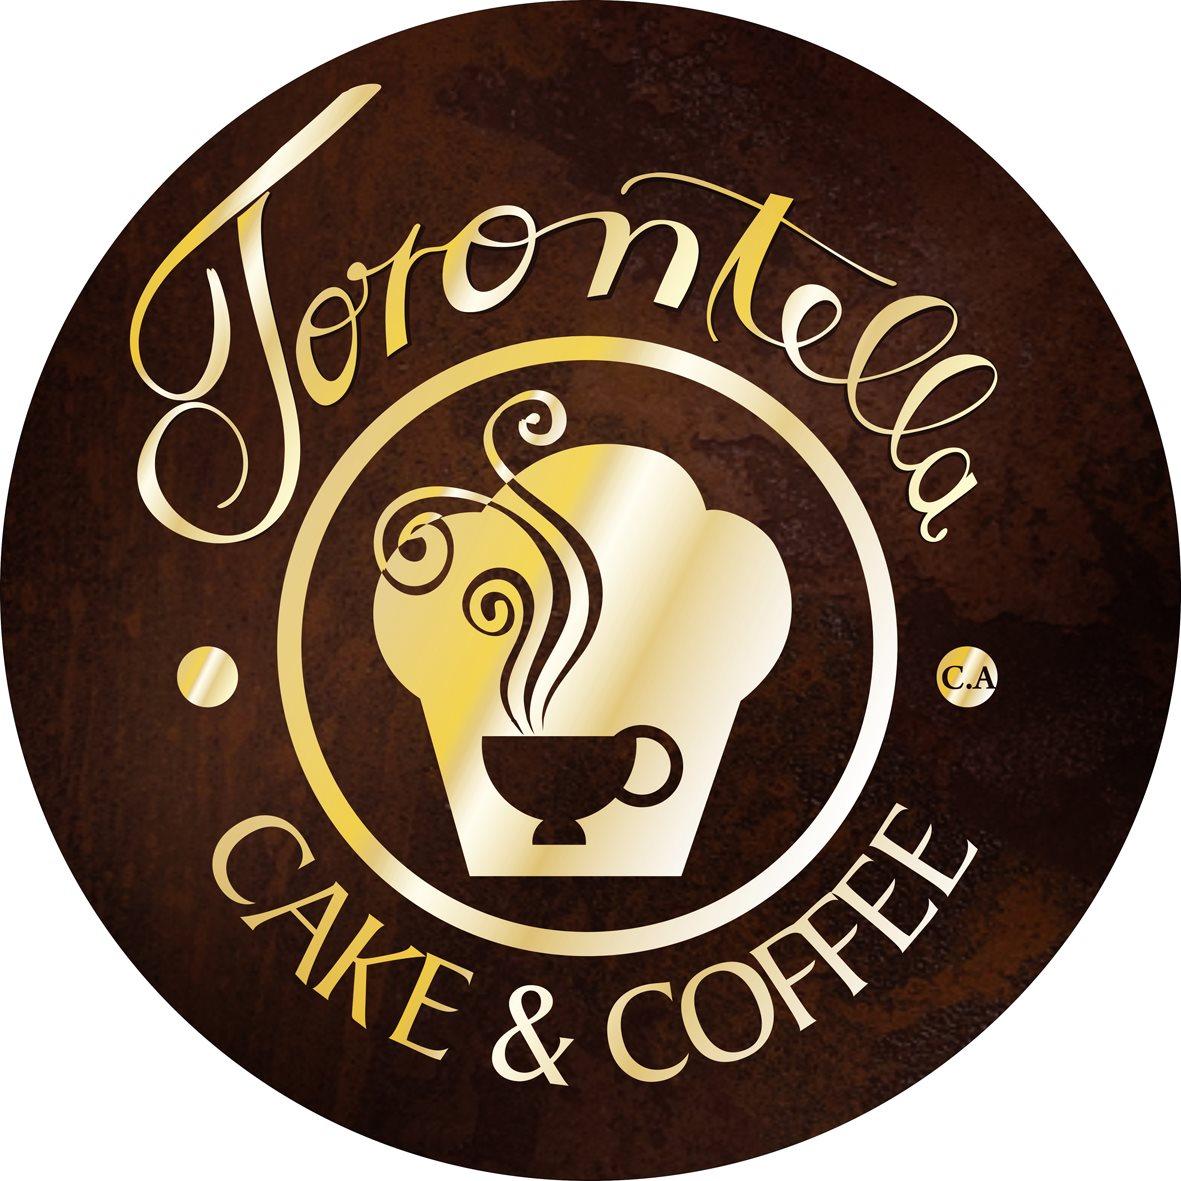 Torontella cake & coffee C.A